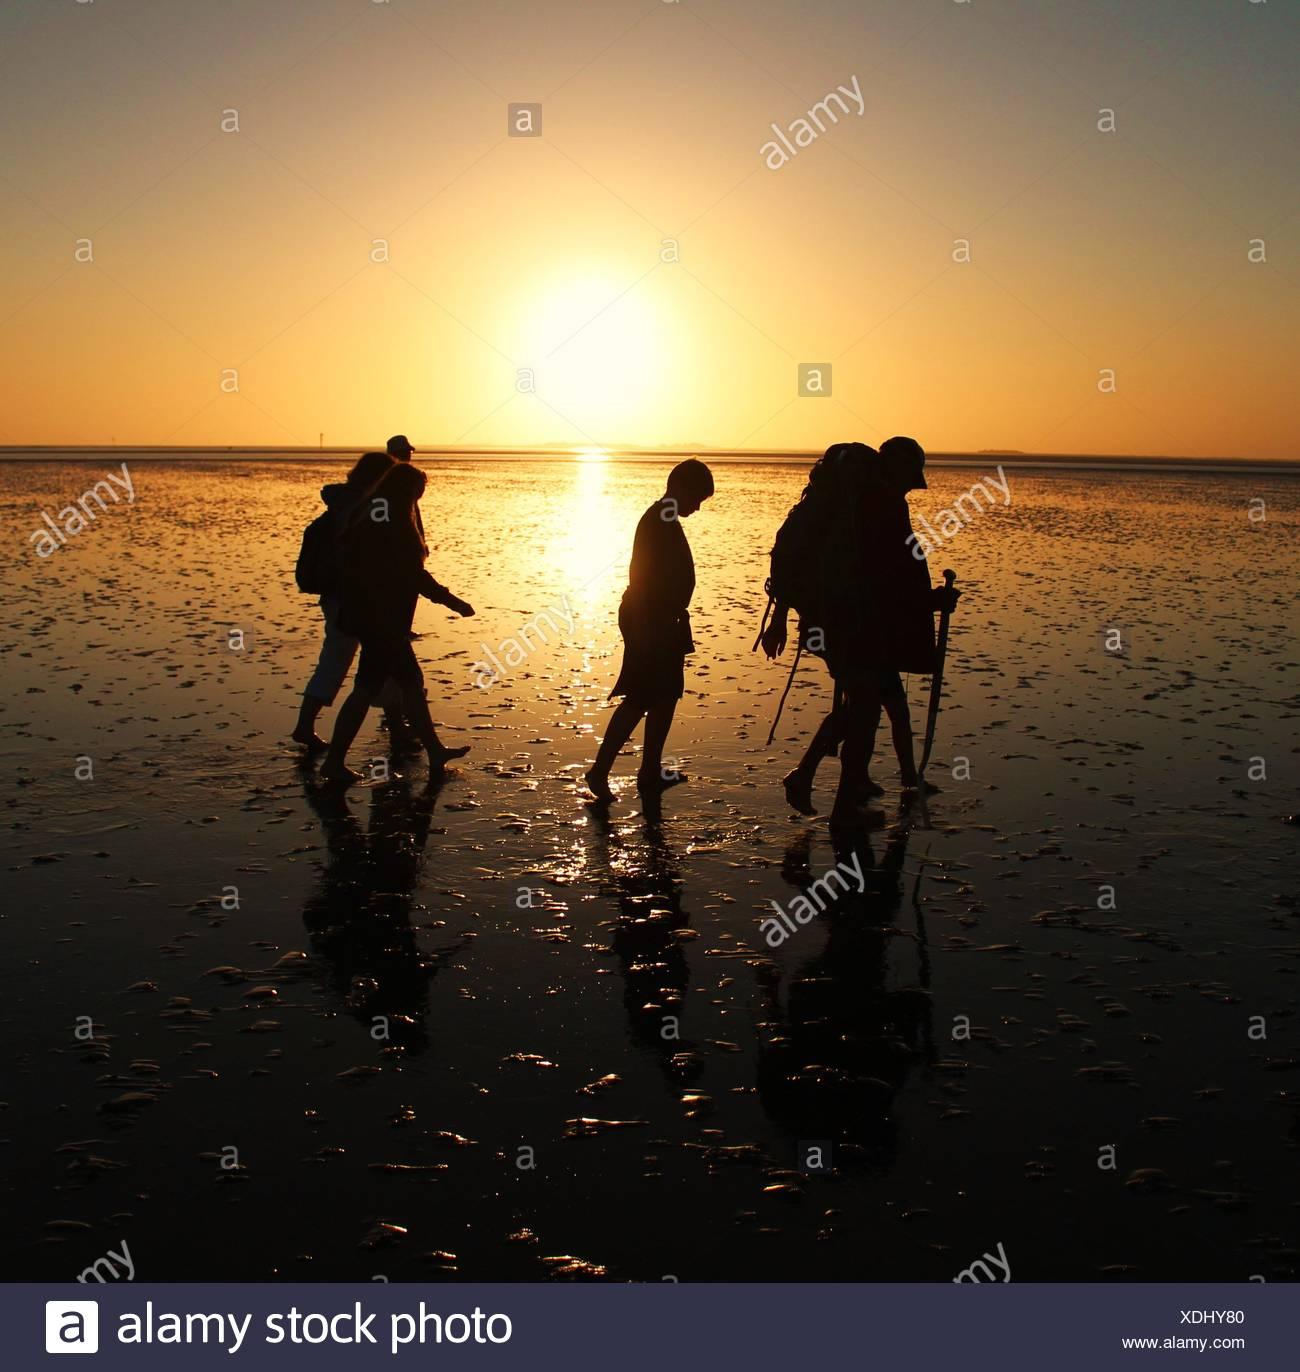 Mud flat wandering at sunset - Stock Image